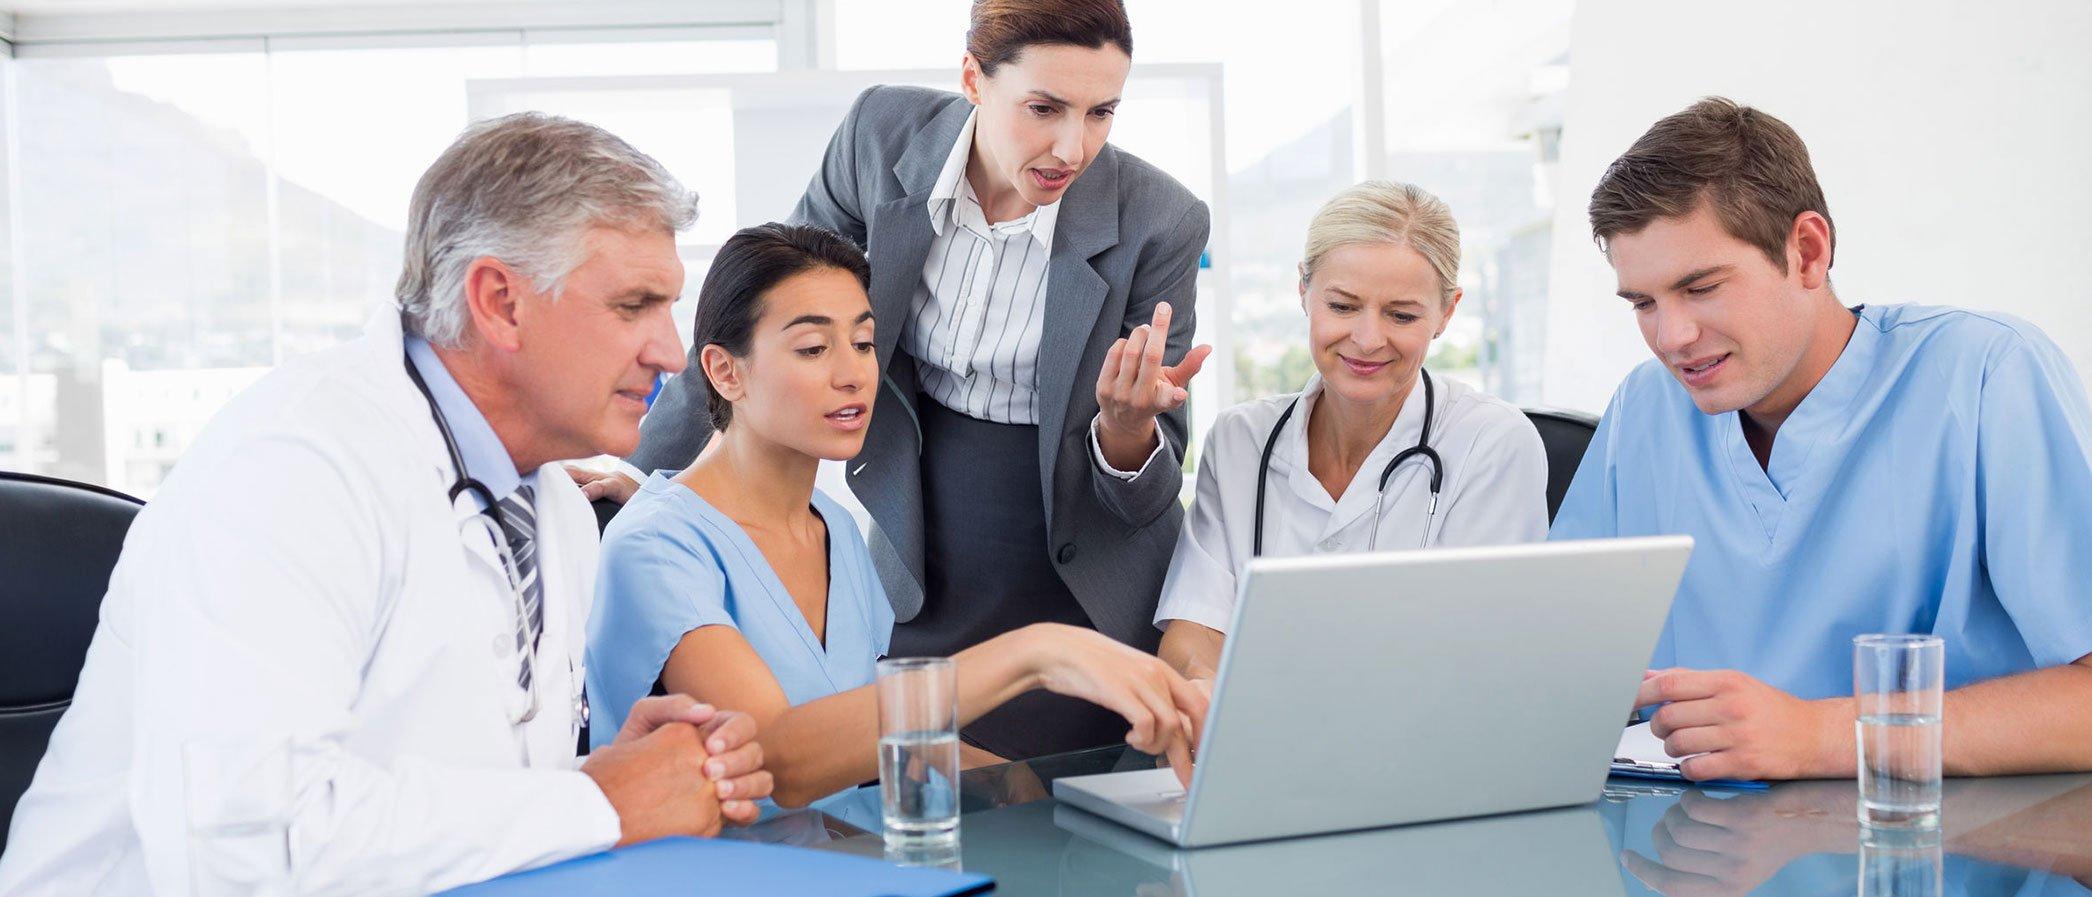 istoc doctors image